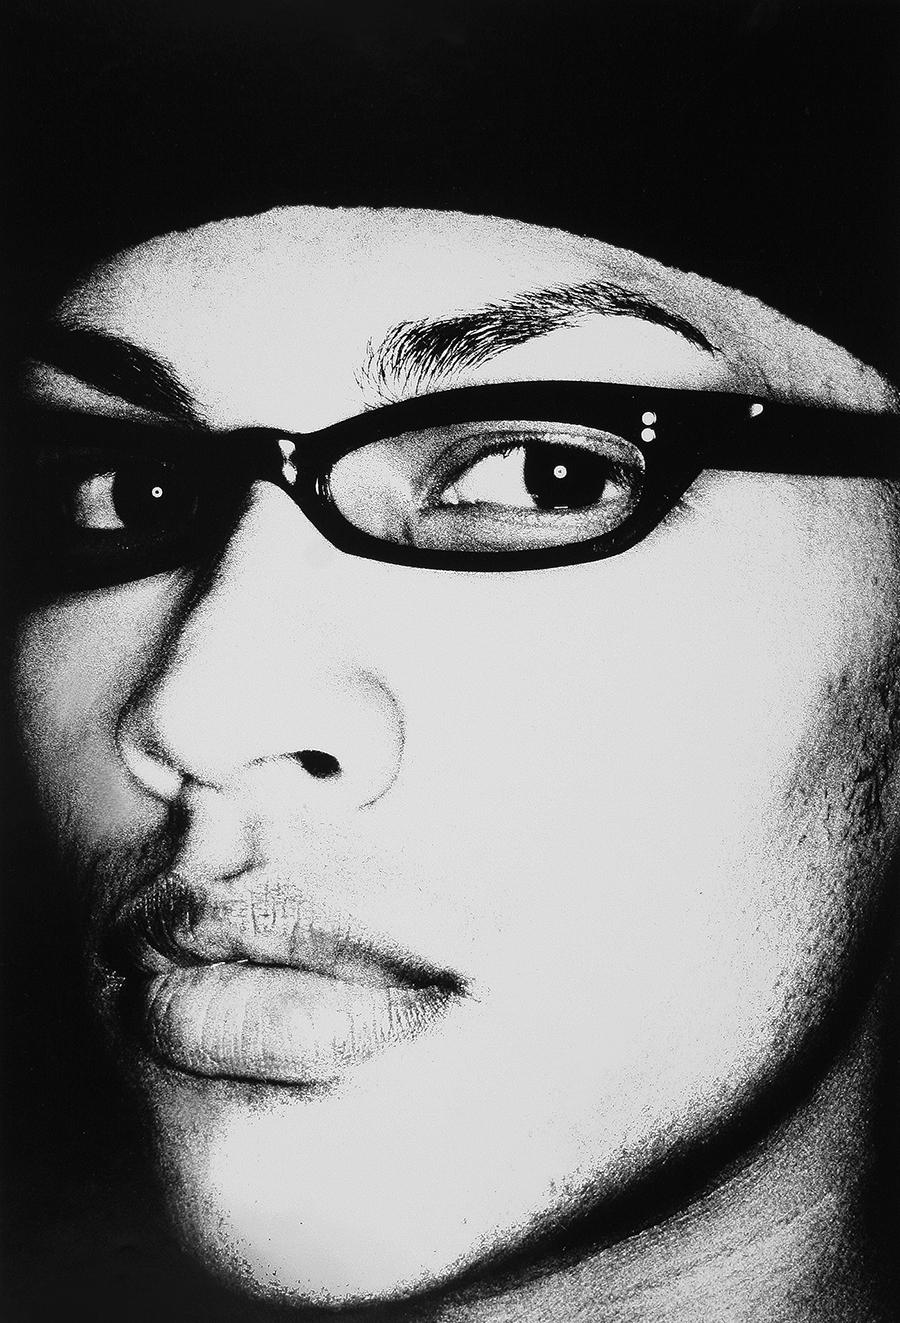 Tony_Ward_early_work_close_ups_1990's_ringflash_eyewear